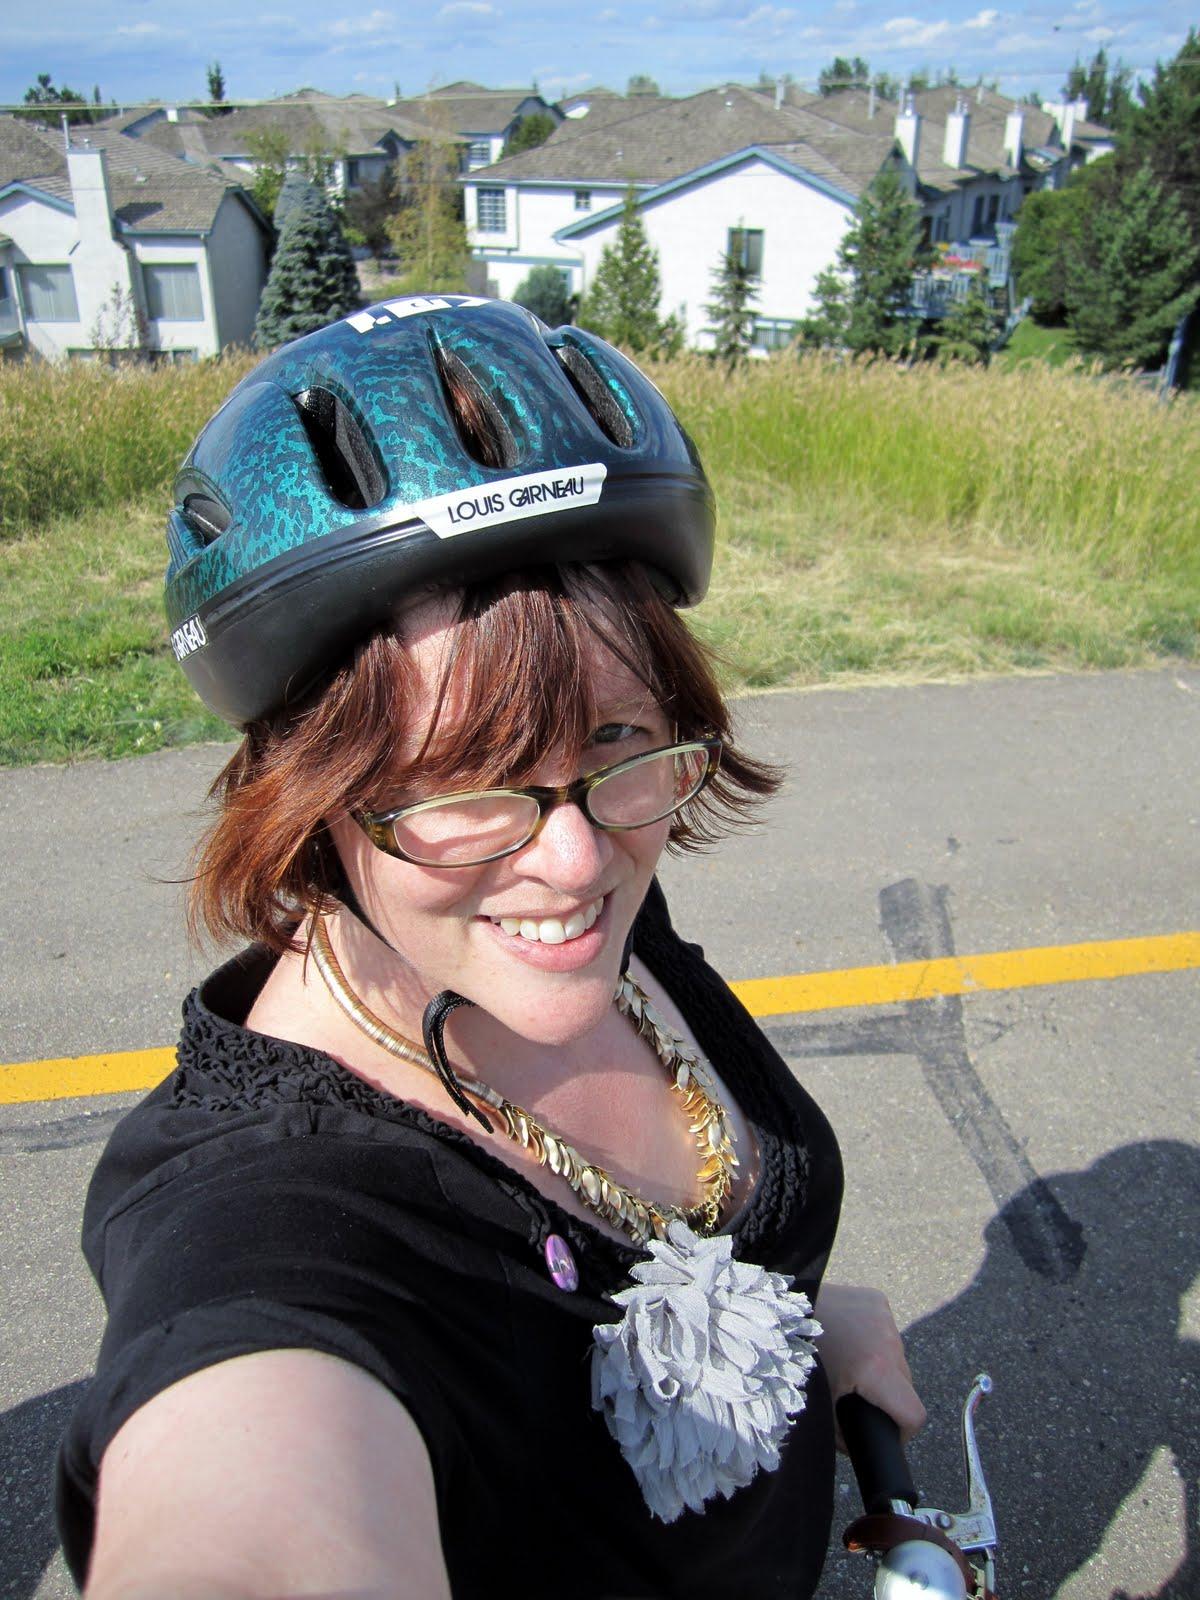 Bike Helmet Kijiji Calgary Game